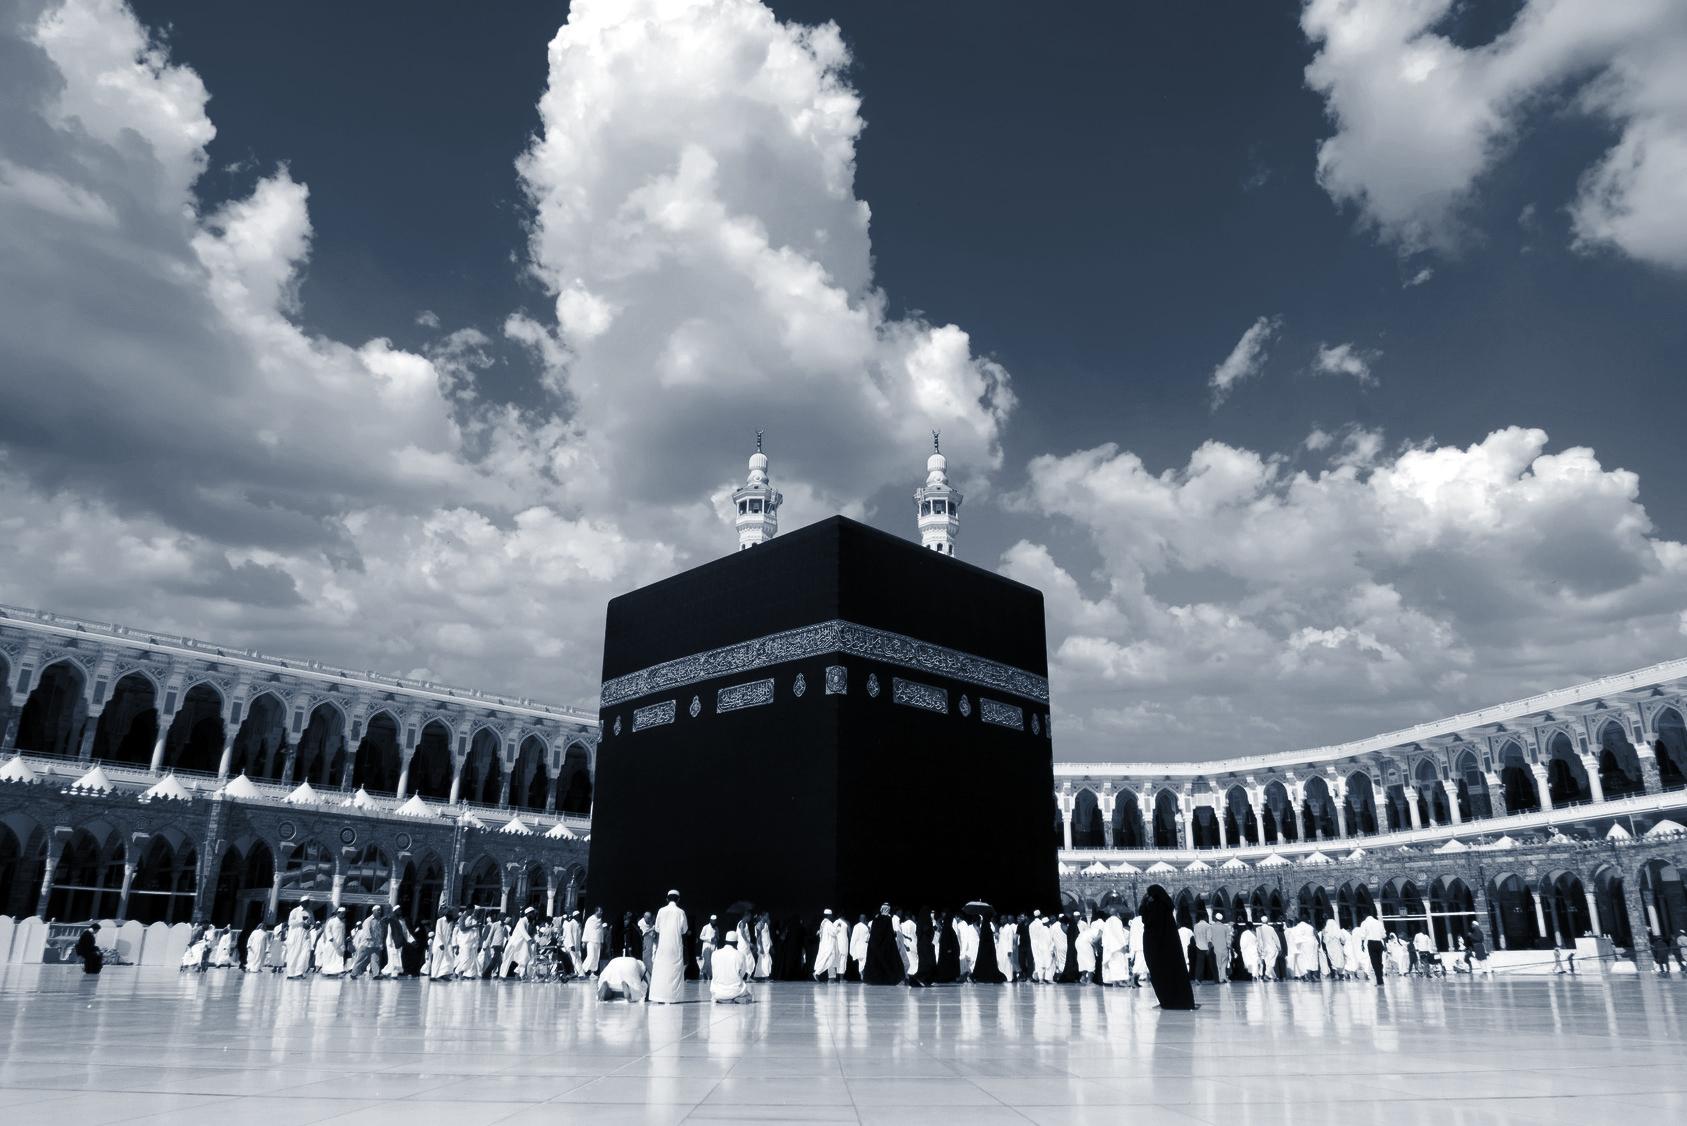 hajj-rituals-makkah-accorhotels copy.jpg